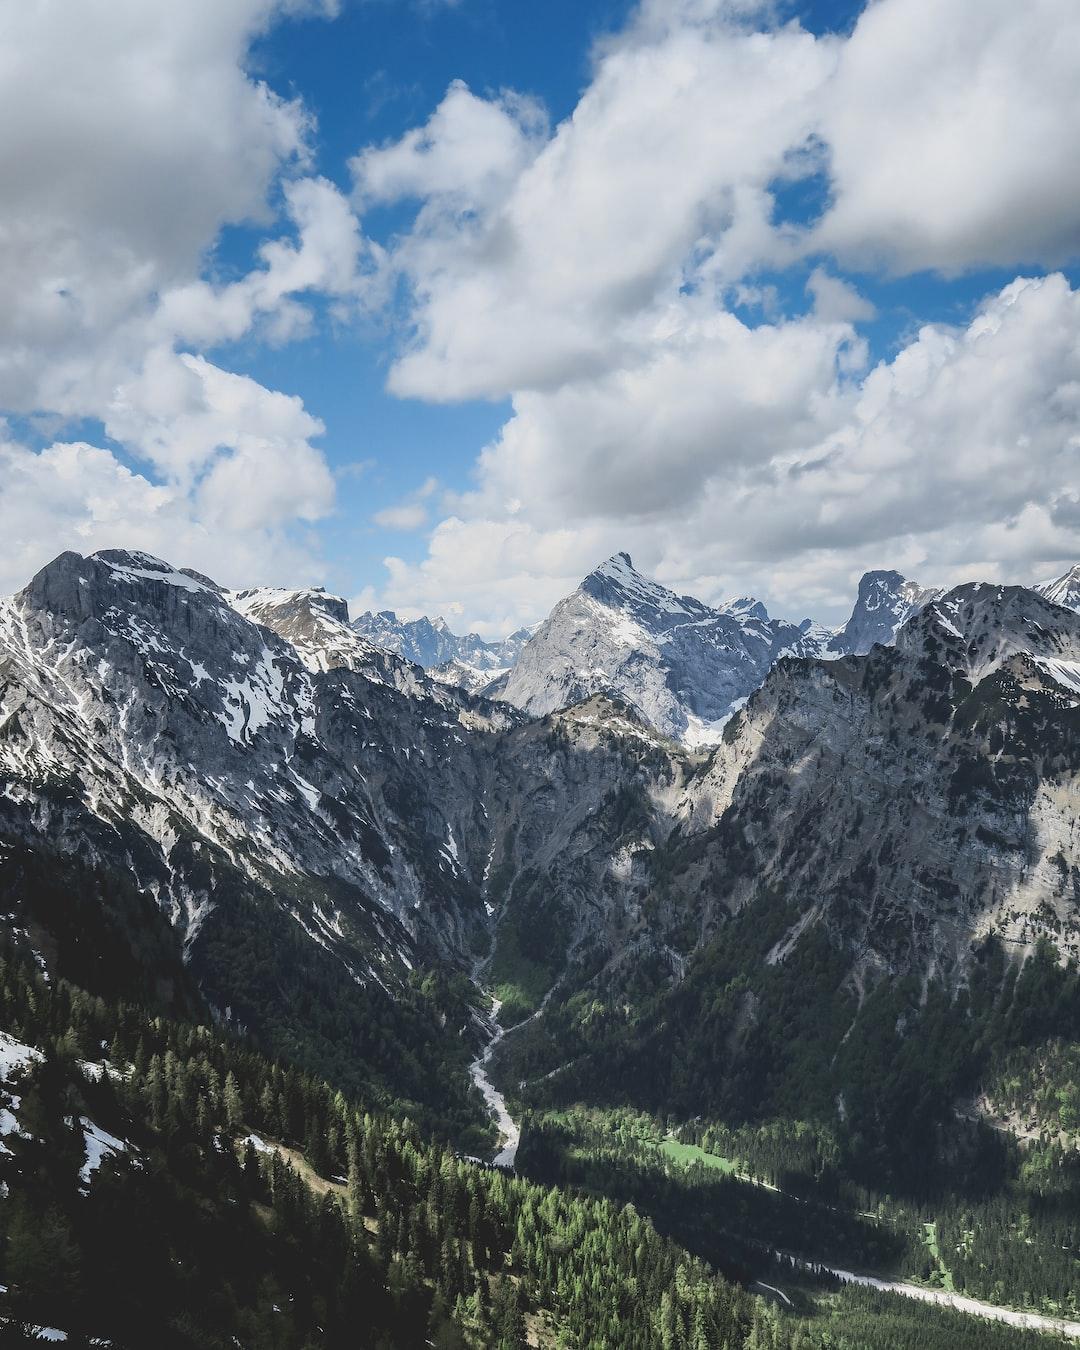 Bärenkopf (Achensee) #myinnsbruck